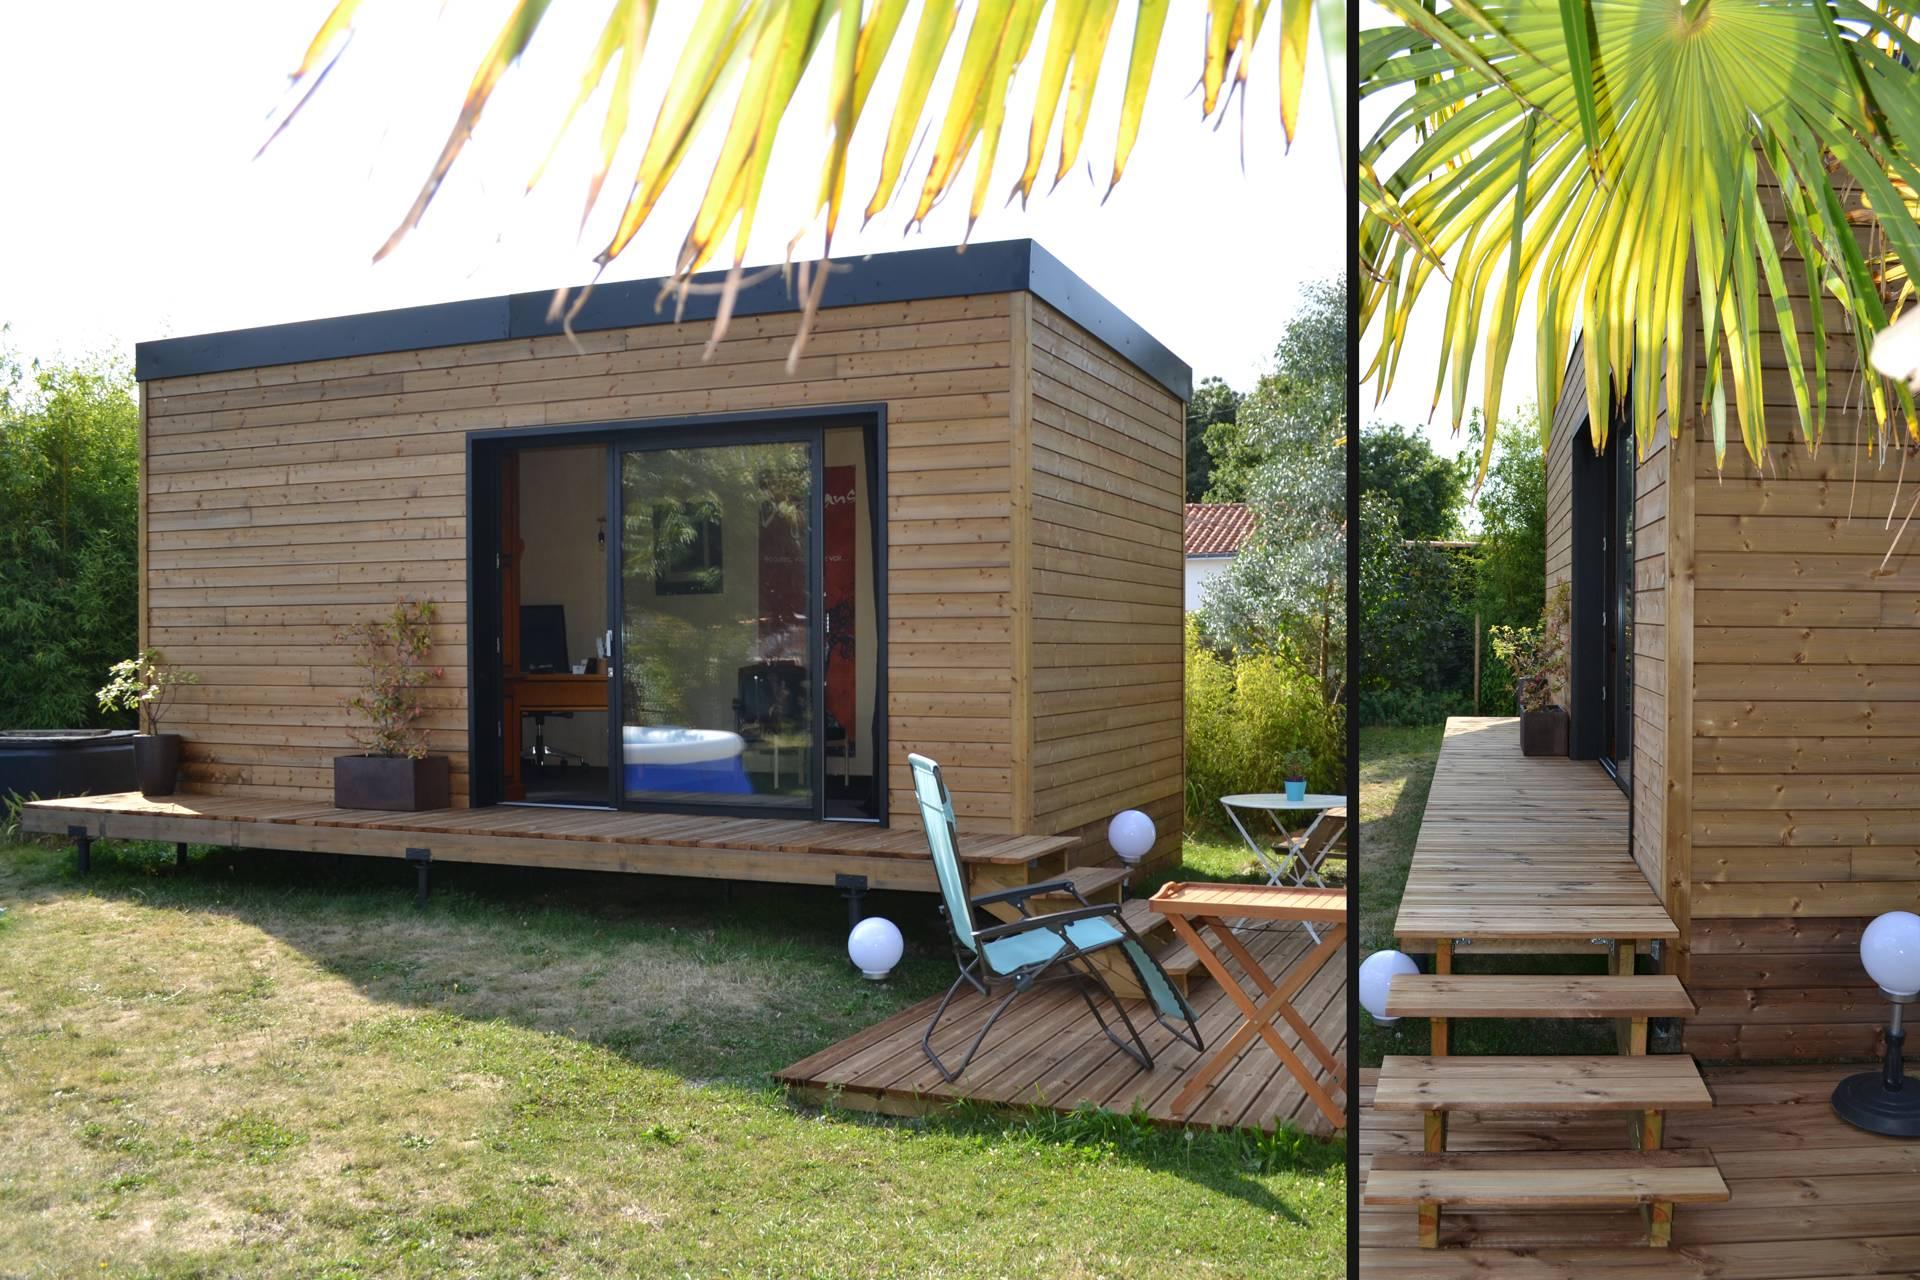 Studio De Jardin 20M2 : Permis De Construire Ou Déclaration ... intérieur Studio De Jardin Habitable